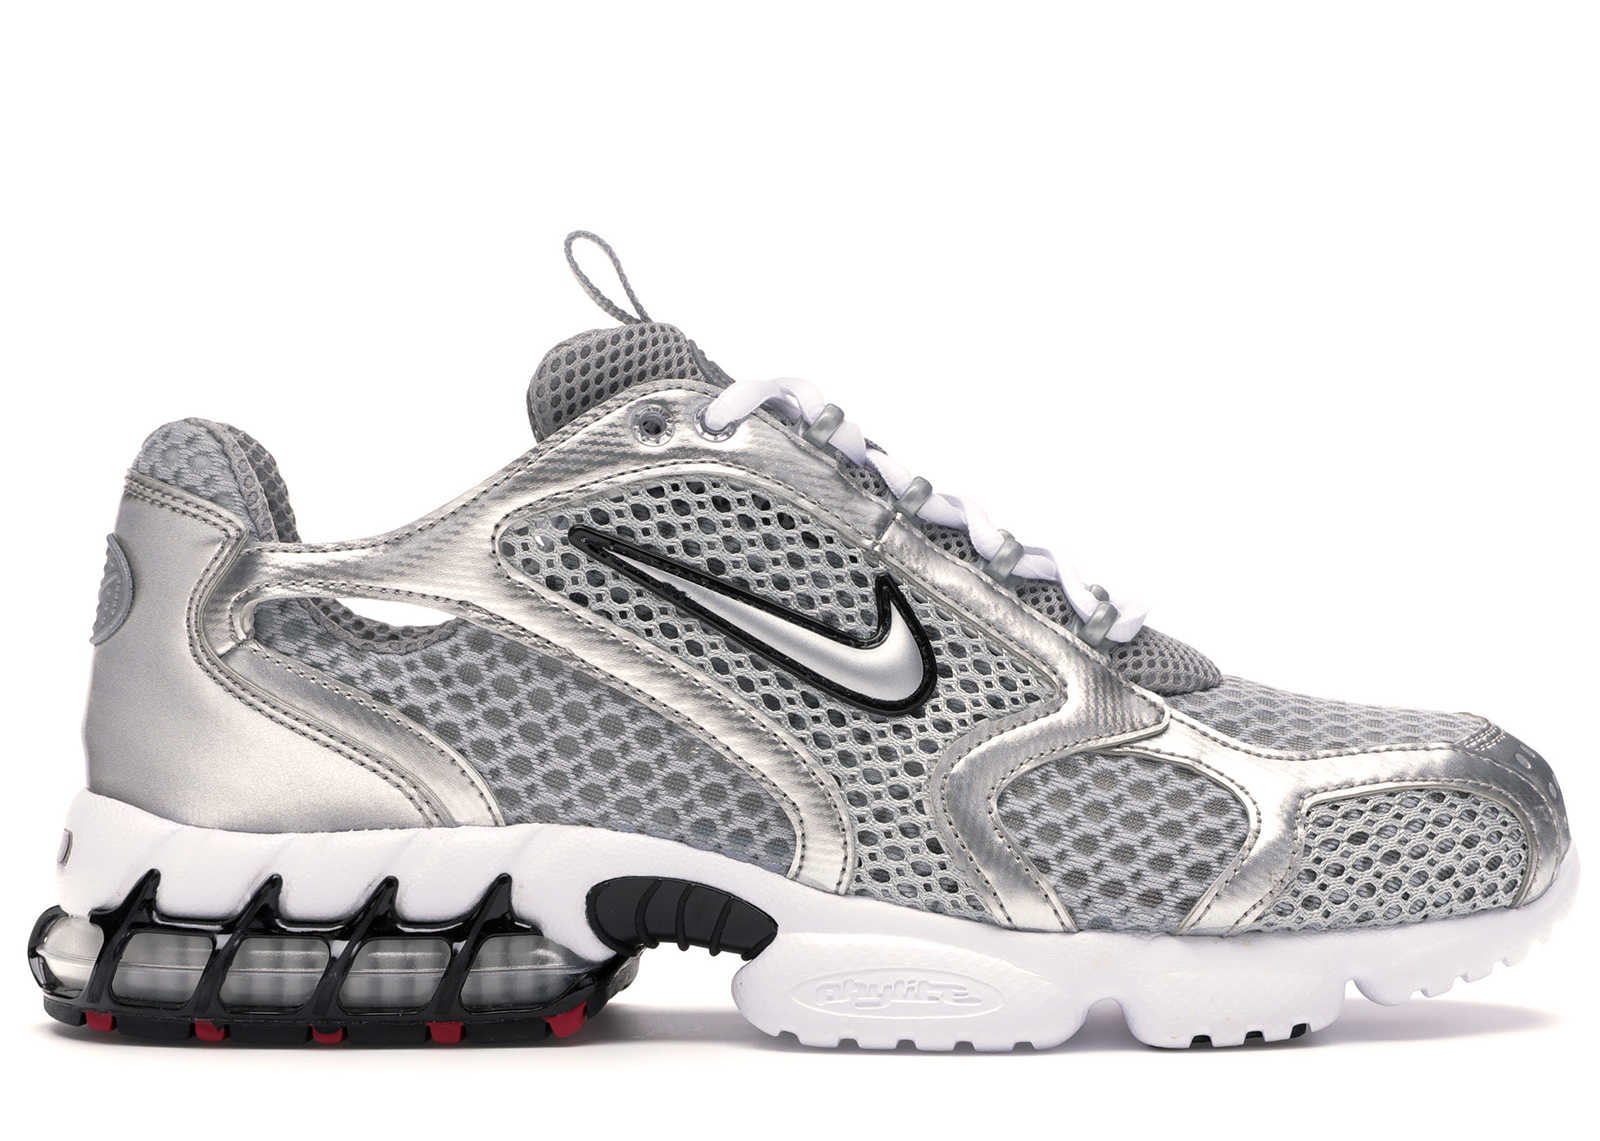 Nike Air Zoom Spiridon Cage 2 Metallic Silver - CJ1288-001